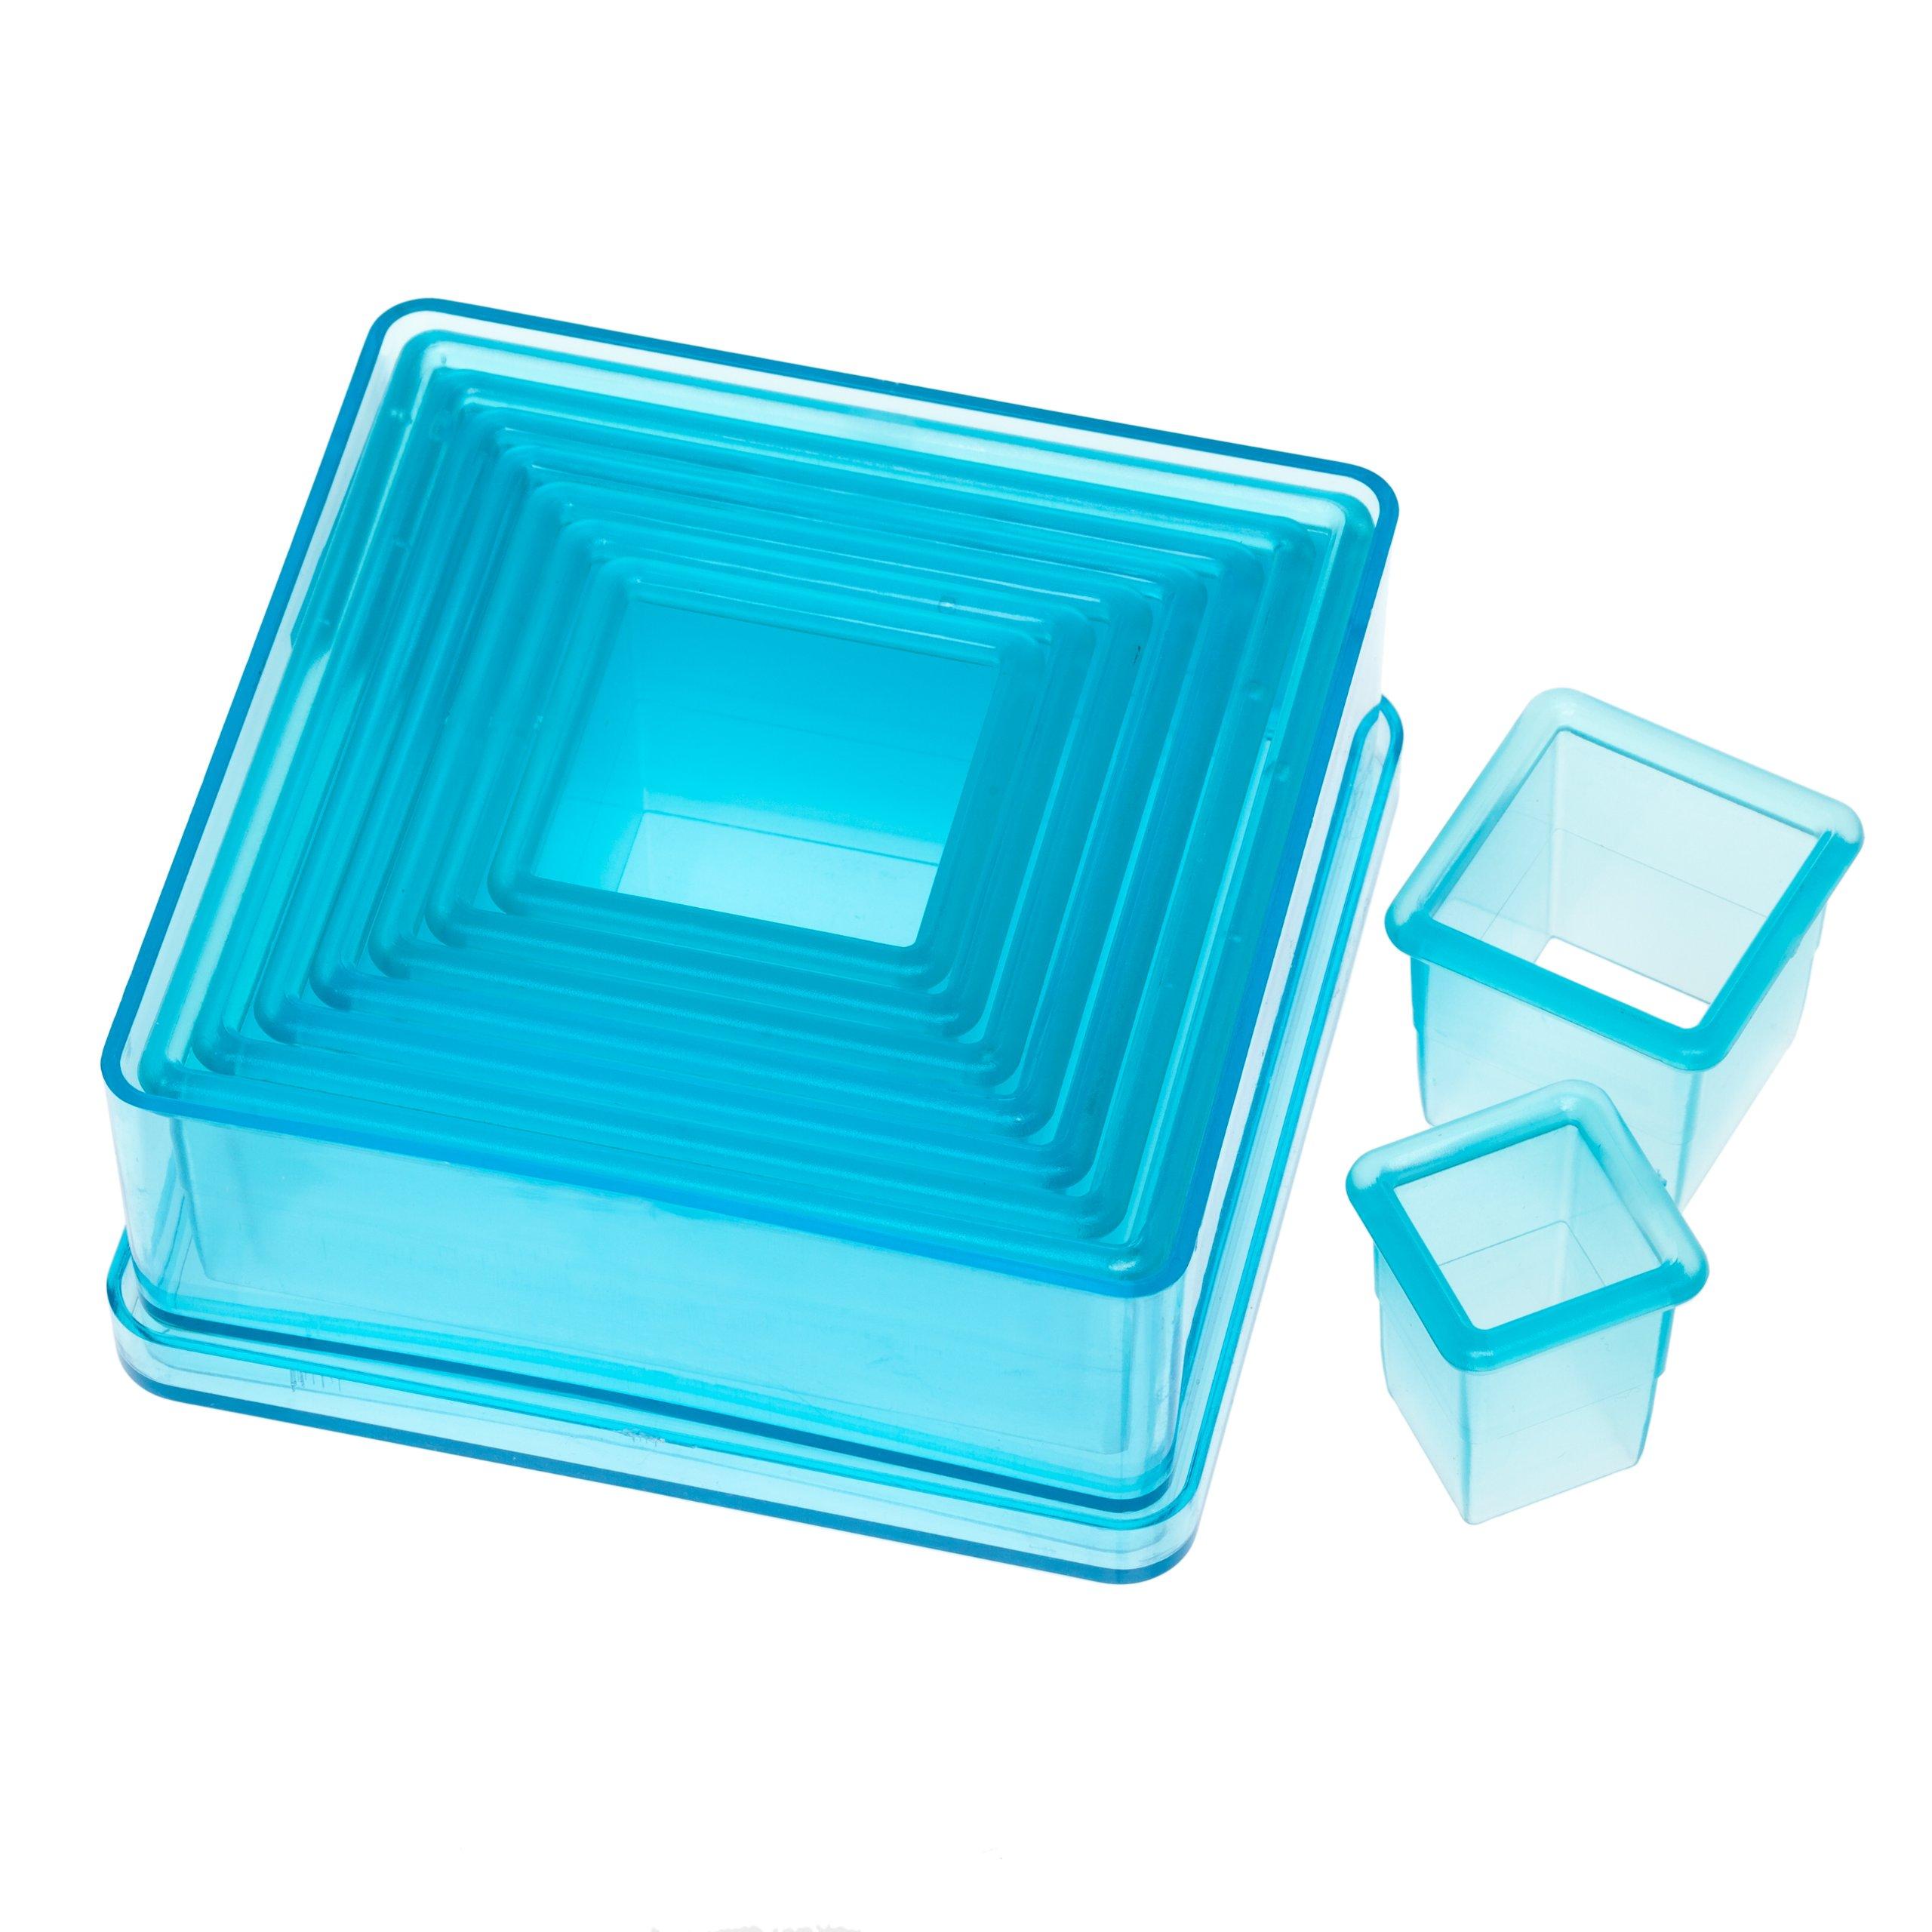 Ateco 5753 Plain Edge Square Cutter Set in Graduated Sizes, Durable, Food-Safe Plastic, 9 Pc Set